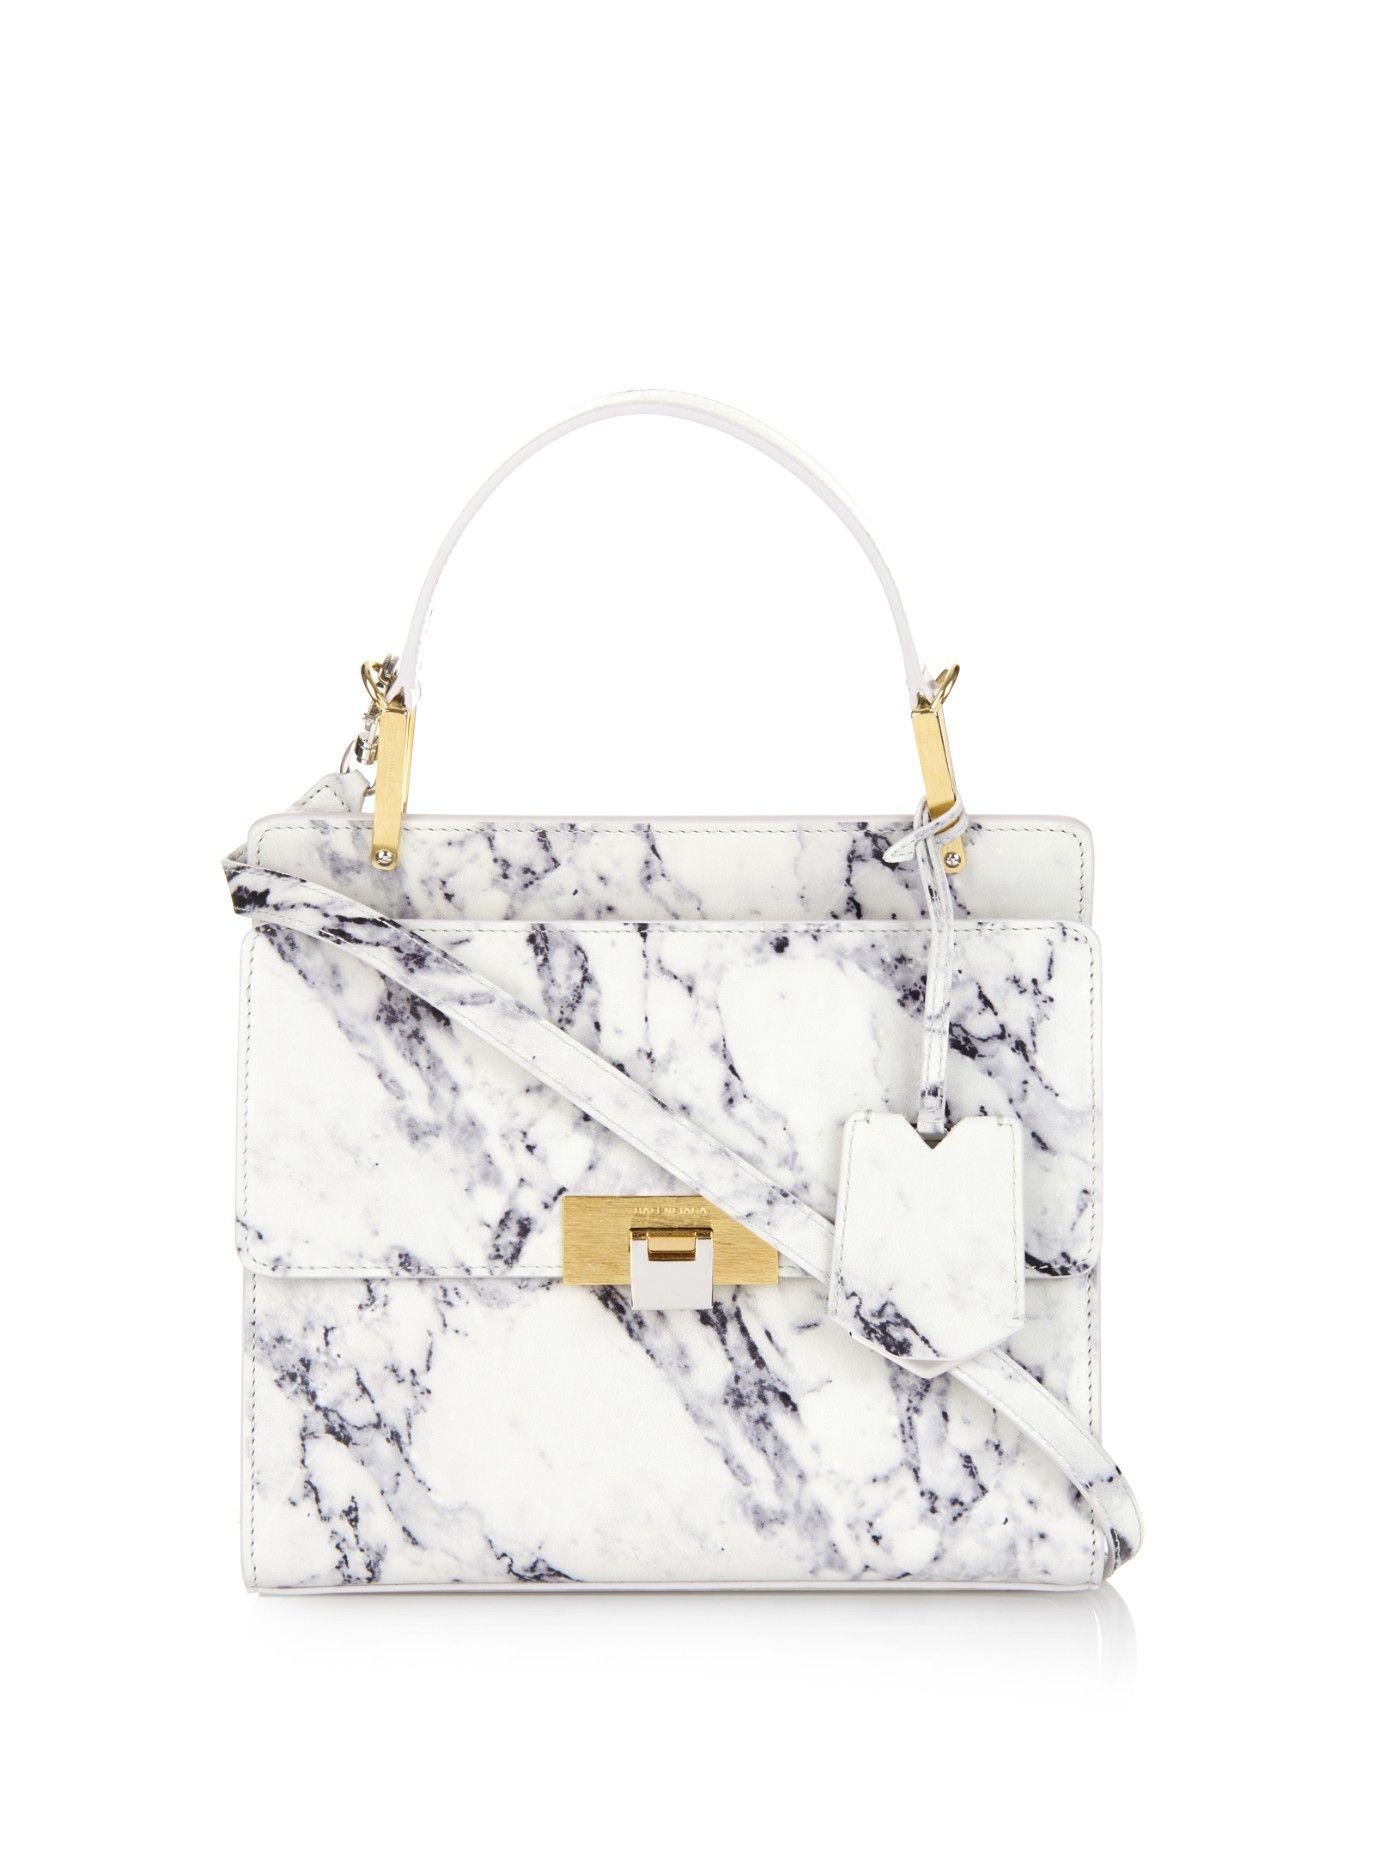 Www Imdb Me Jessicasirls Fashion Style Handbag Purse Marble Le Dix Cartable S Cross Body Bag Balenciaga Matchesfashion Com Us